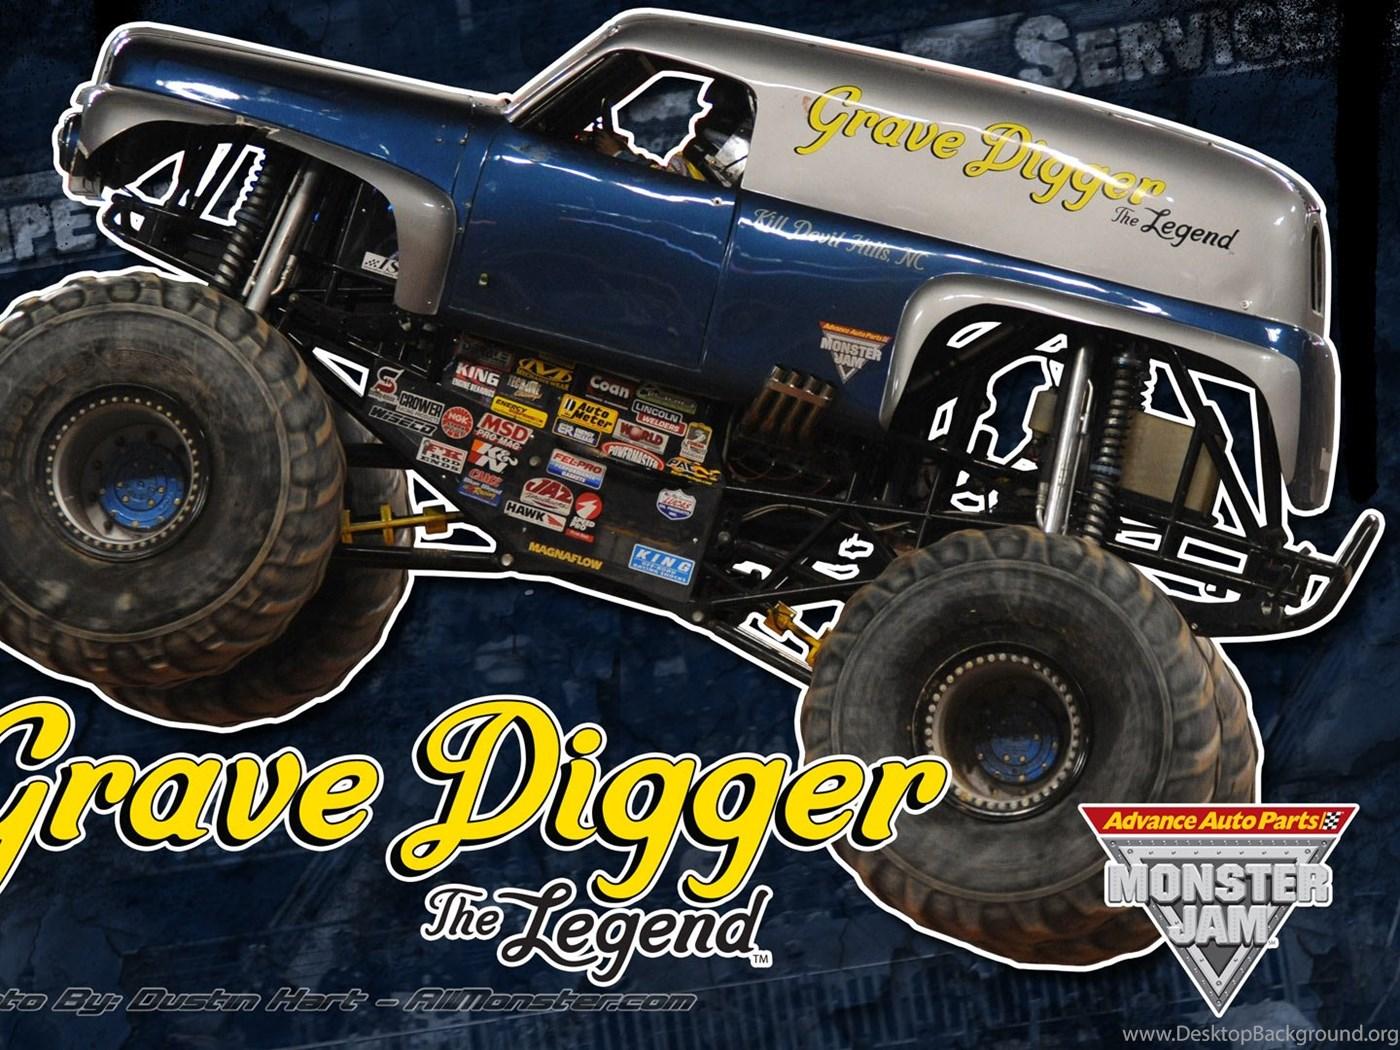 Monster Truck Wallpapers - Advance Auto Parts Monster Jam , HD Wallpaper & Backgrounds